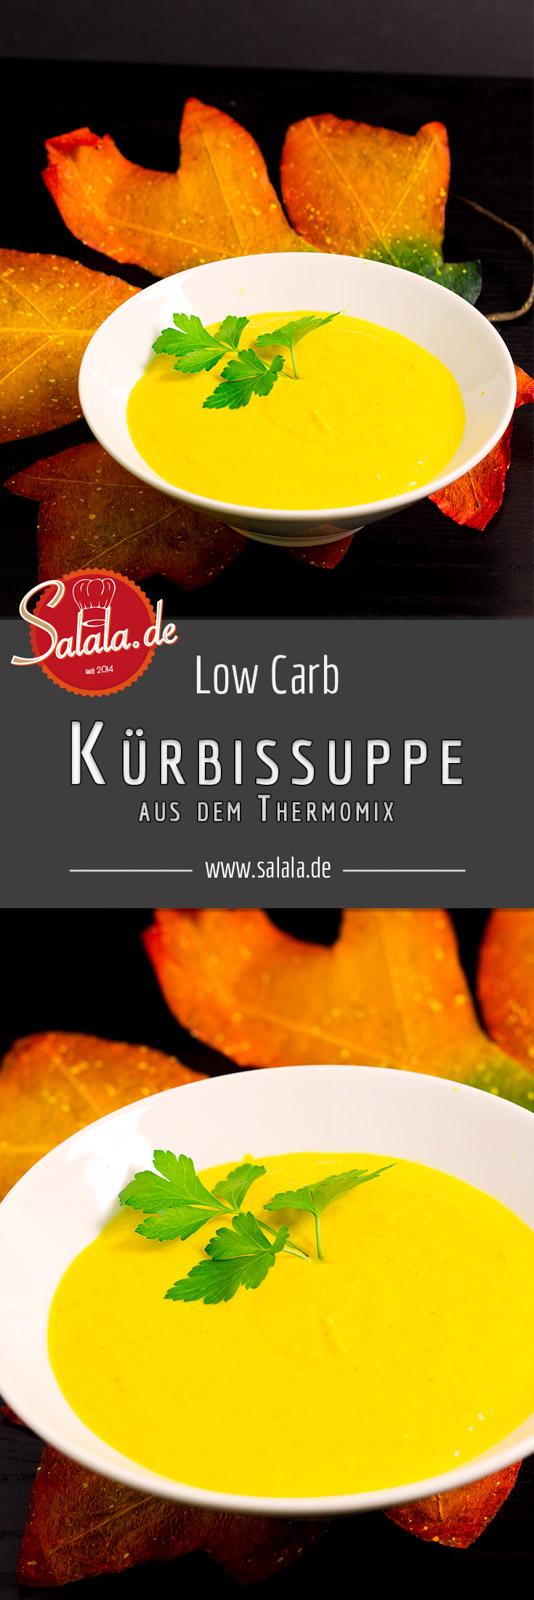 Schnelle Low Carb Kürbissuppe aus dem Thermomix - by salala.de - Thermomix Kürbissuppe Herbstrezept Butternusskürbis Low Carb Glutenfrei